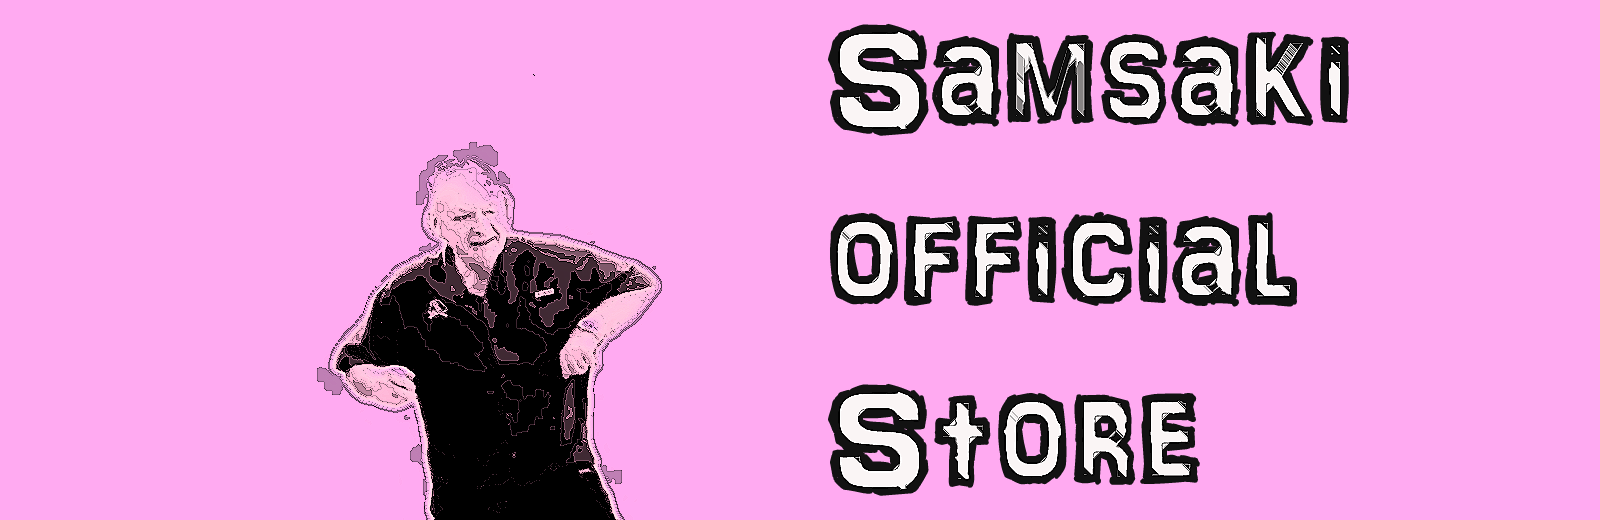 Samsaki official store Store